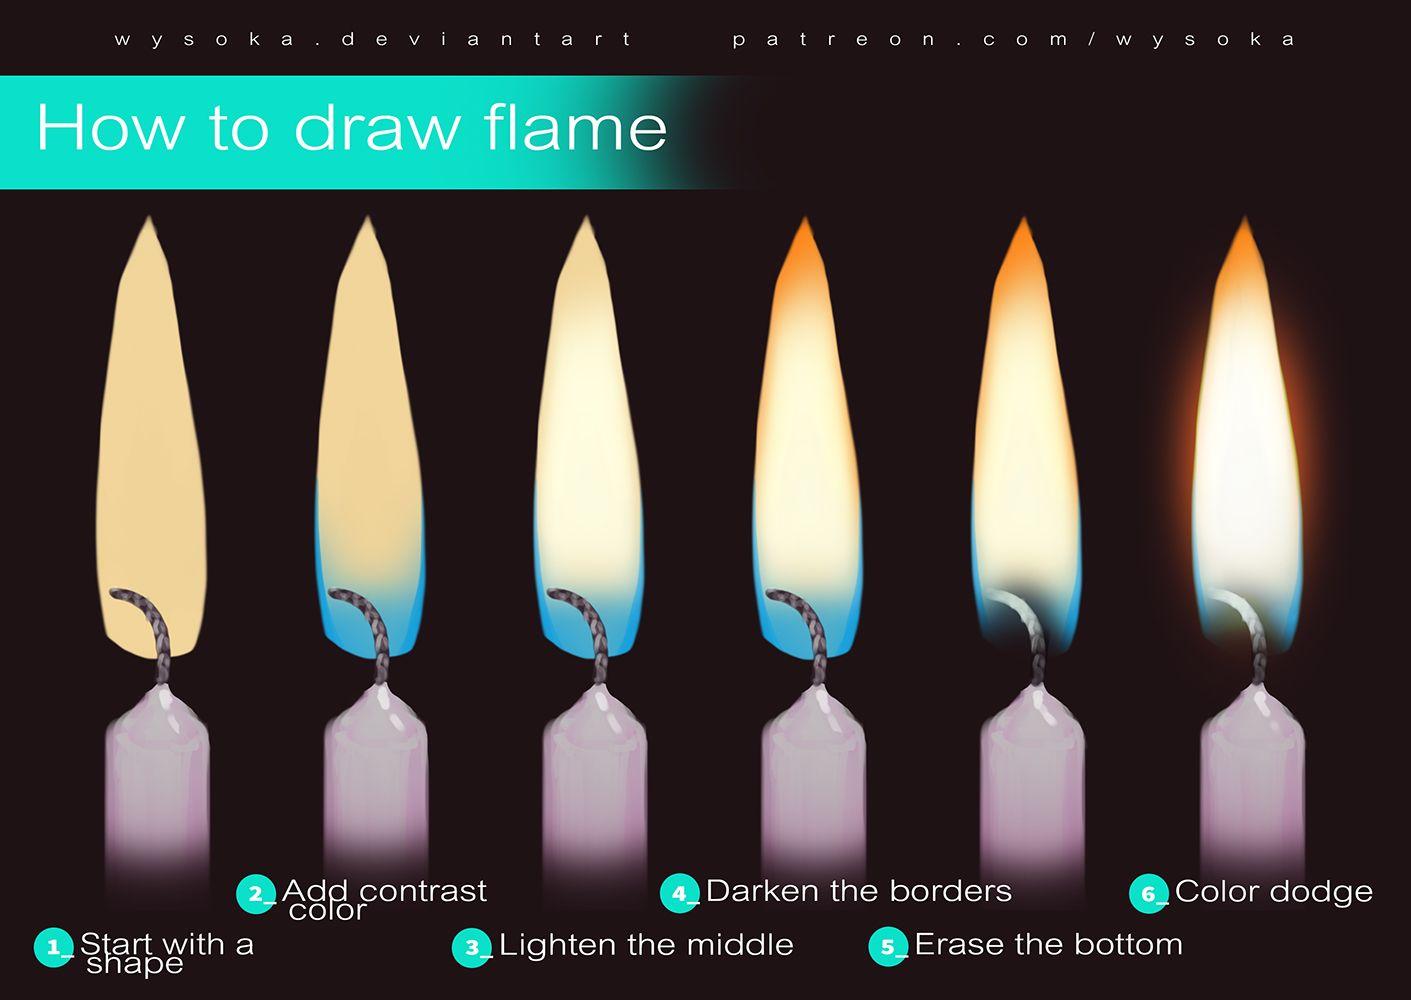 How To Draw Flame by wysoka on DeviantArt